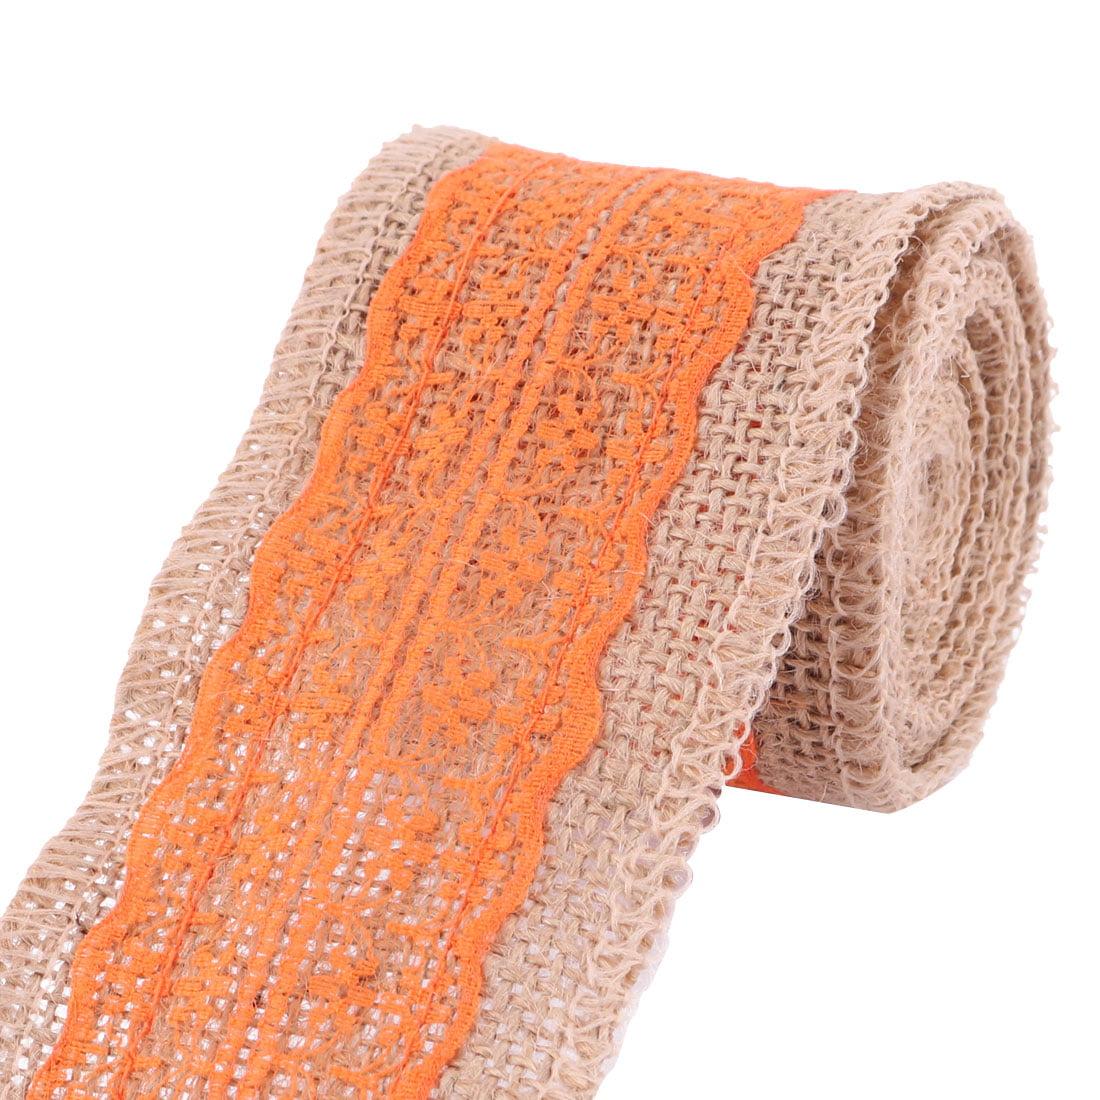 Household Linen Chair Gift Box Decor DIY Sewing Ribbon Roll Orange 2.3 Yards